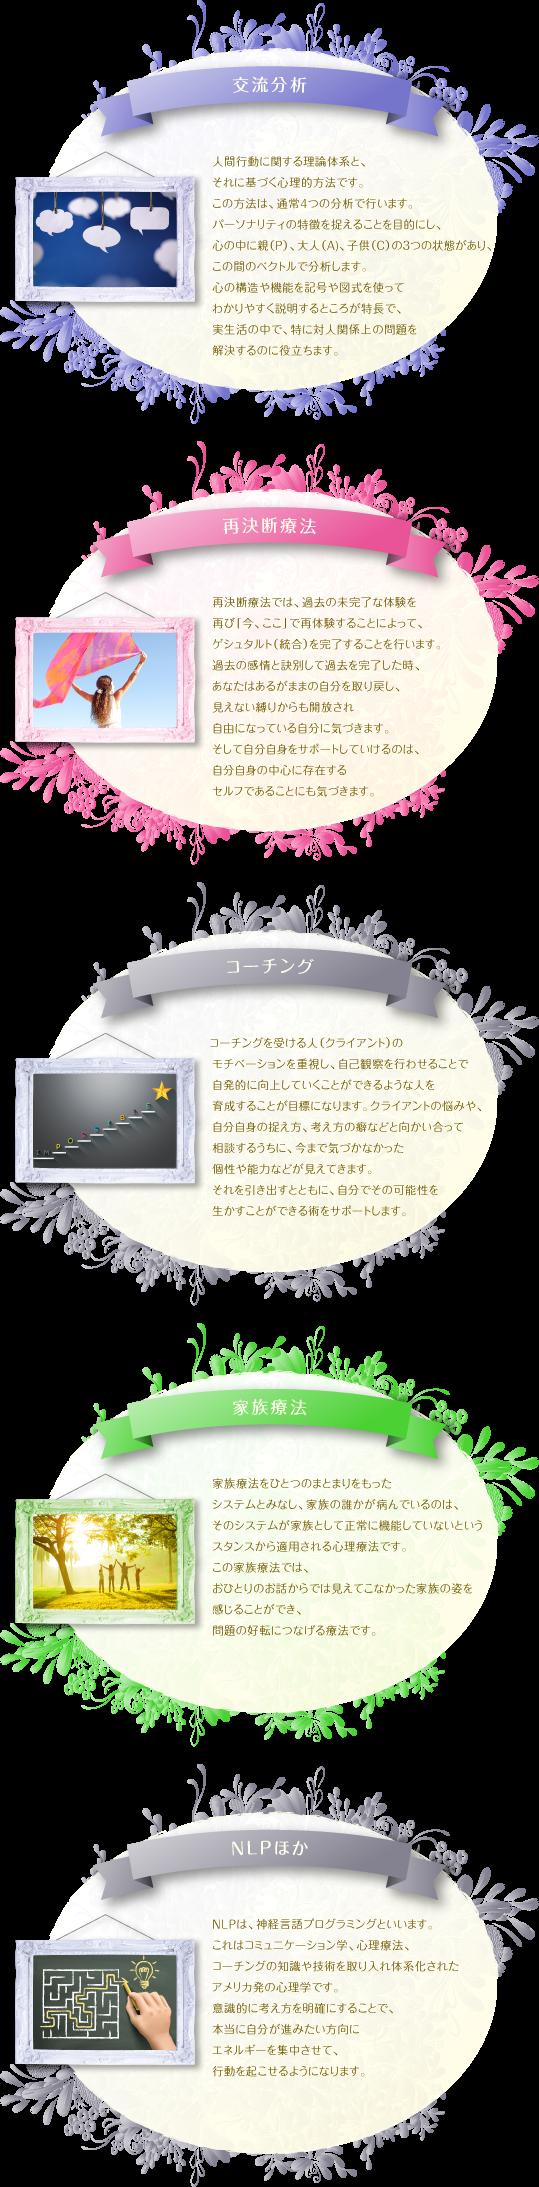 tokyo_setagaya_shimokitszawa_counseling_therapy_coaching341